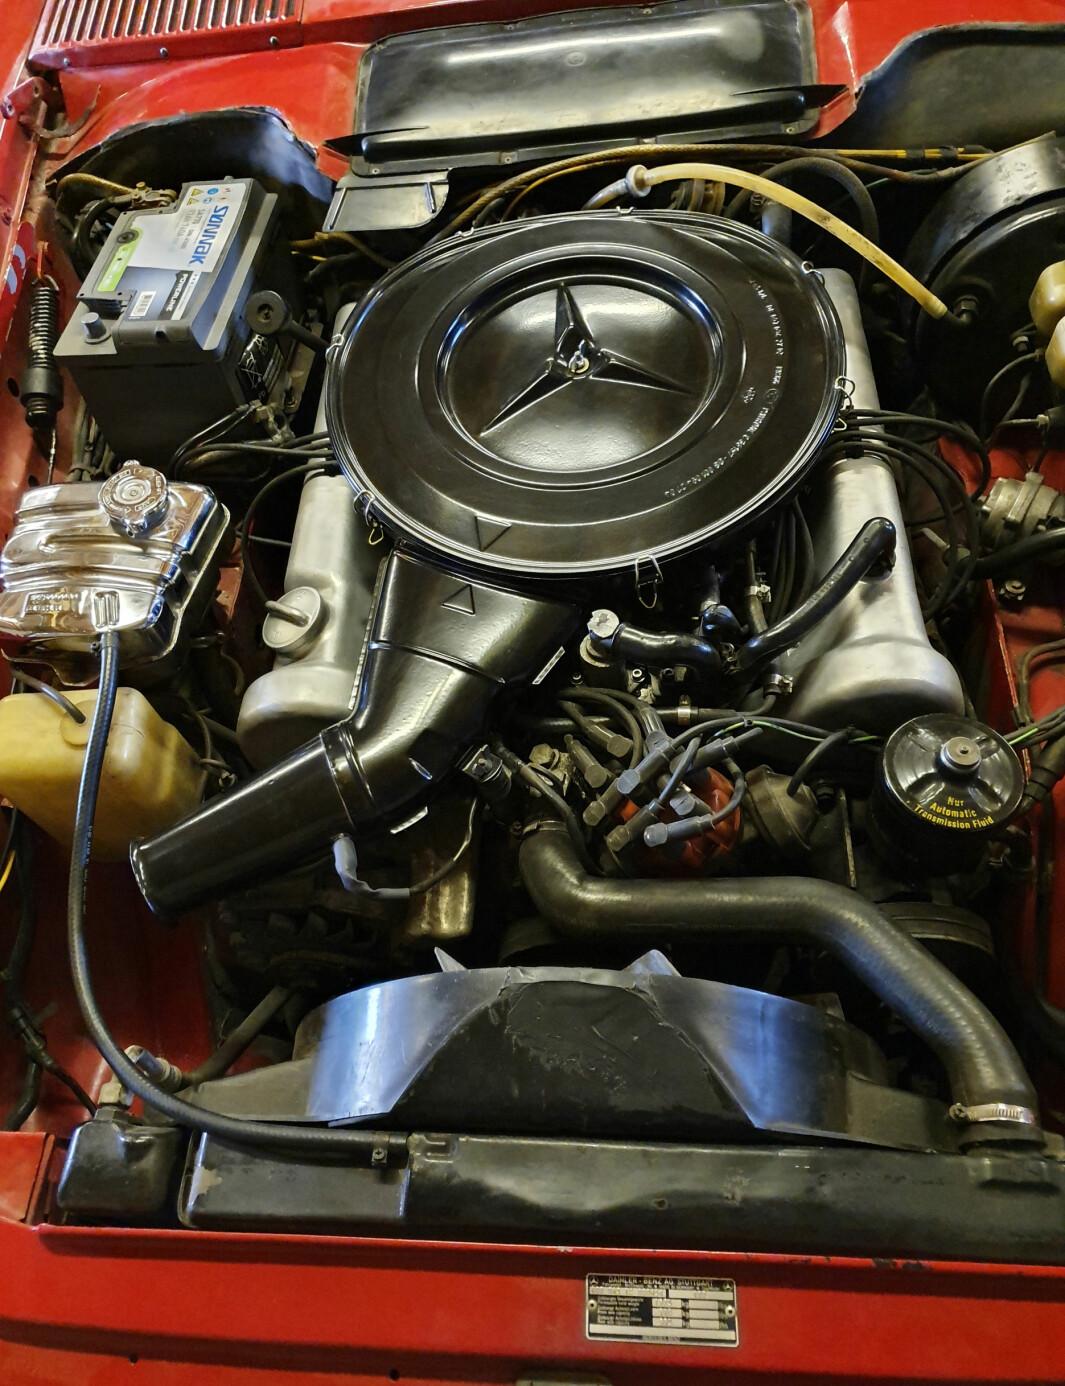 "<span class=""font-weight-bold"" data-lab-font_weight_desktop=""font-weight-bold"">INDRE ORGANER: </span>Slik ser det ut i brystkassa til Geir Schau – eller mer presist: under panseret på hans Mercedes 350 SL."